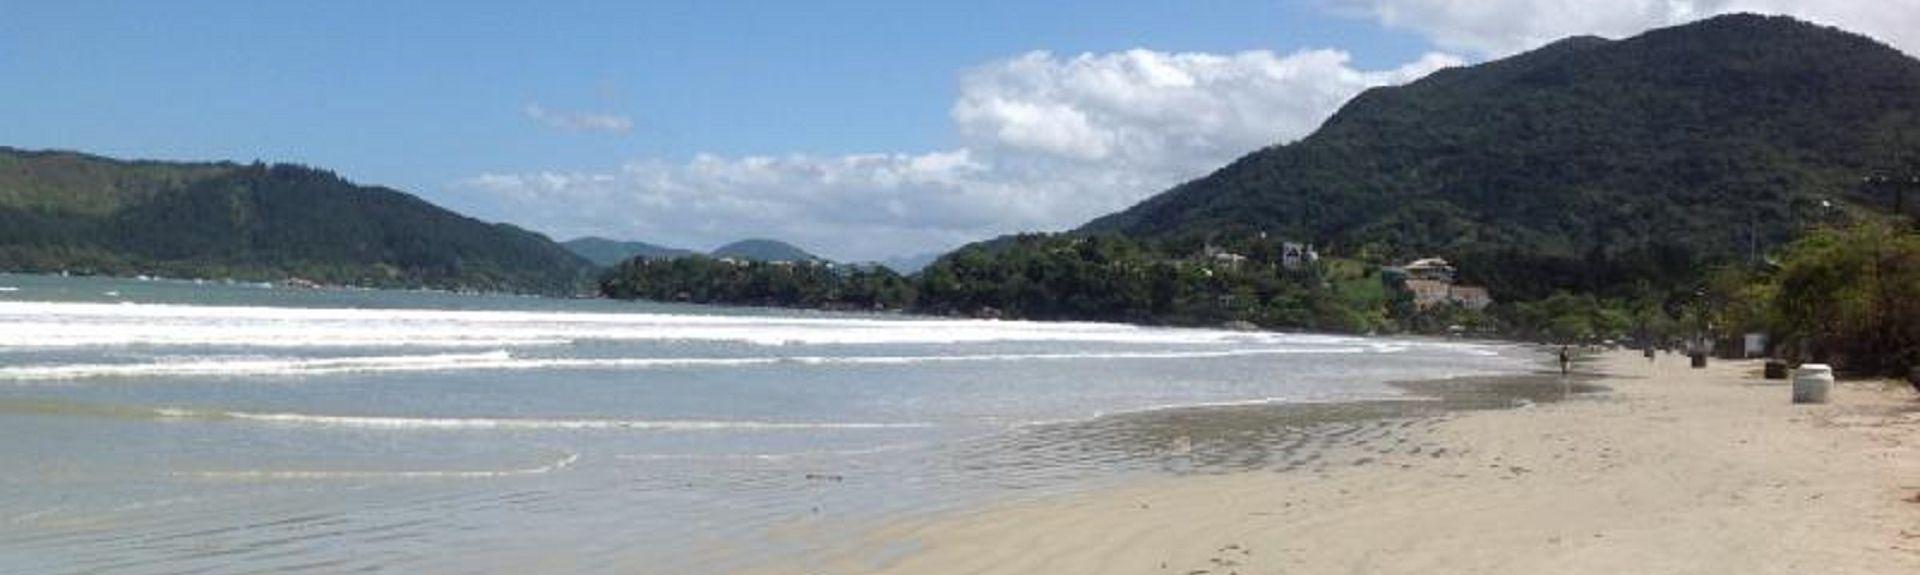 Toninhas, Ubatuba, Southeast Region, Brazil